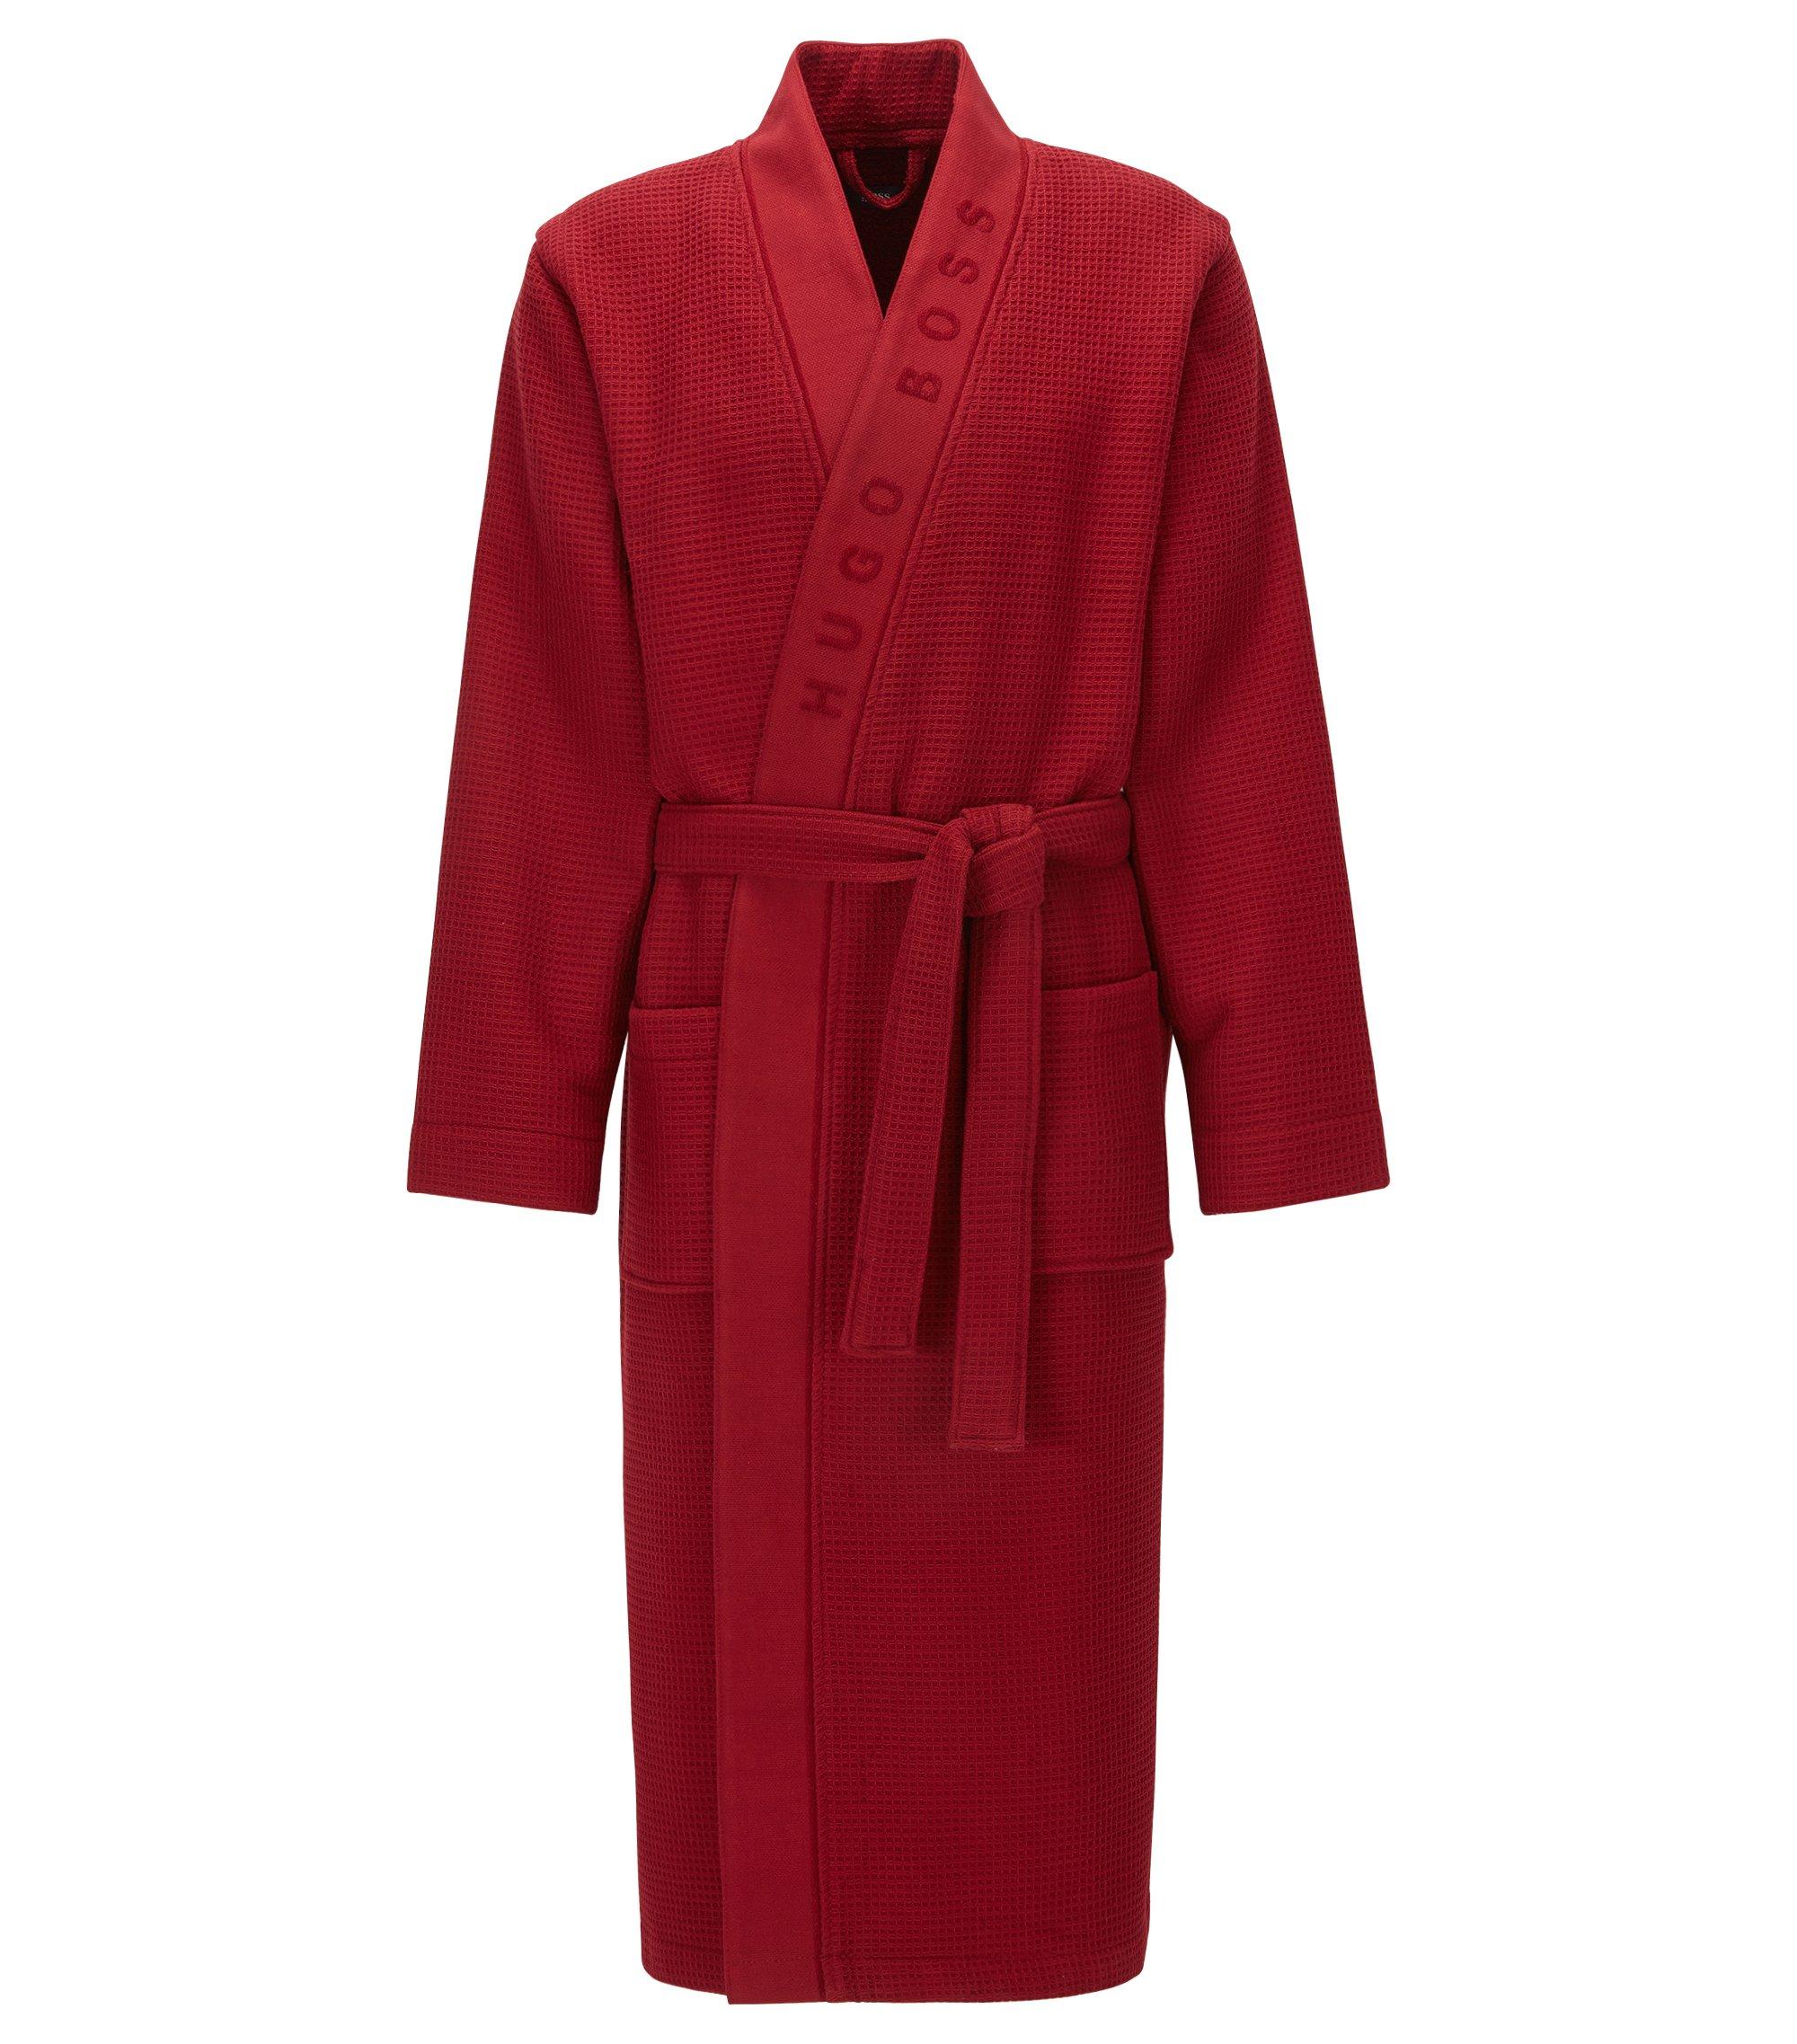 Batín en tejido con textura, Rojo oscuro